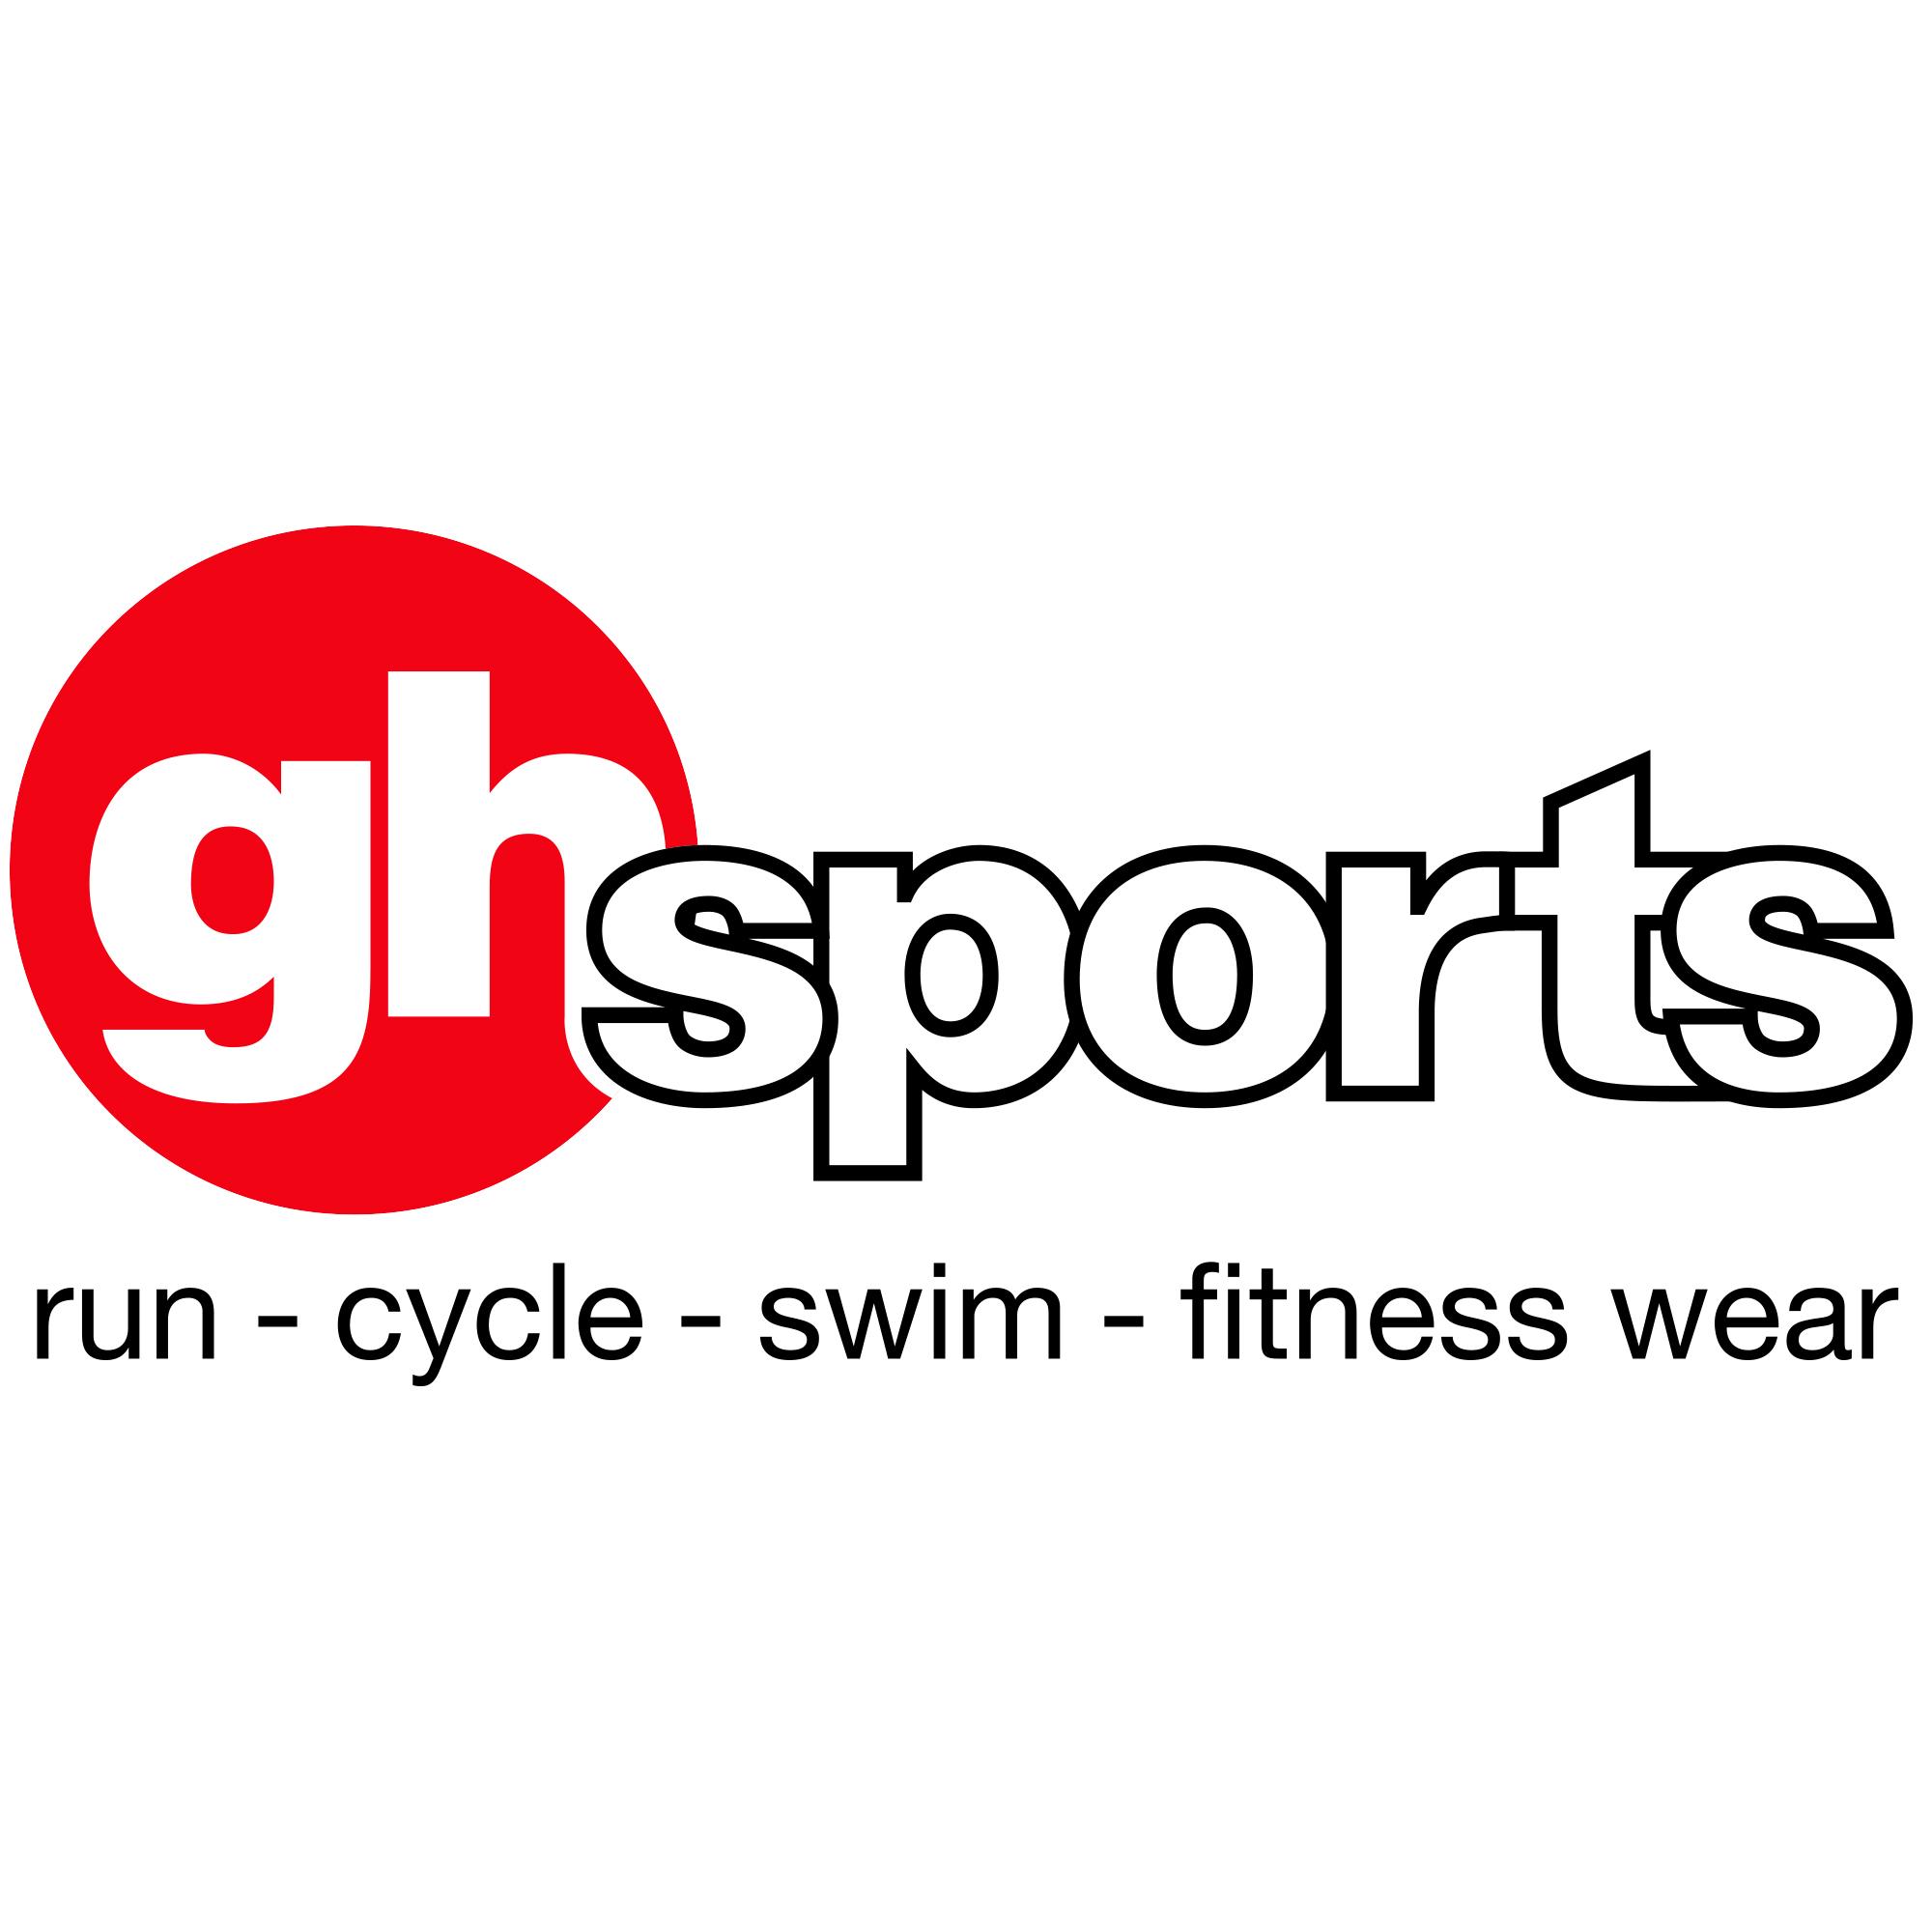 ghsports logo